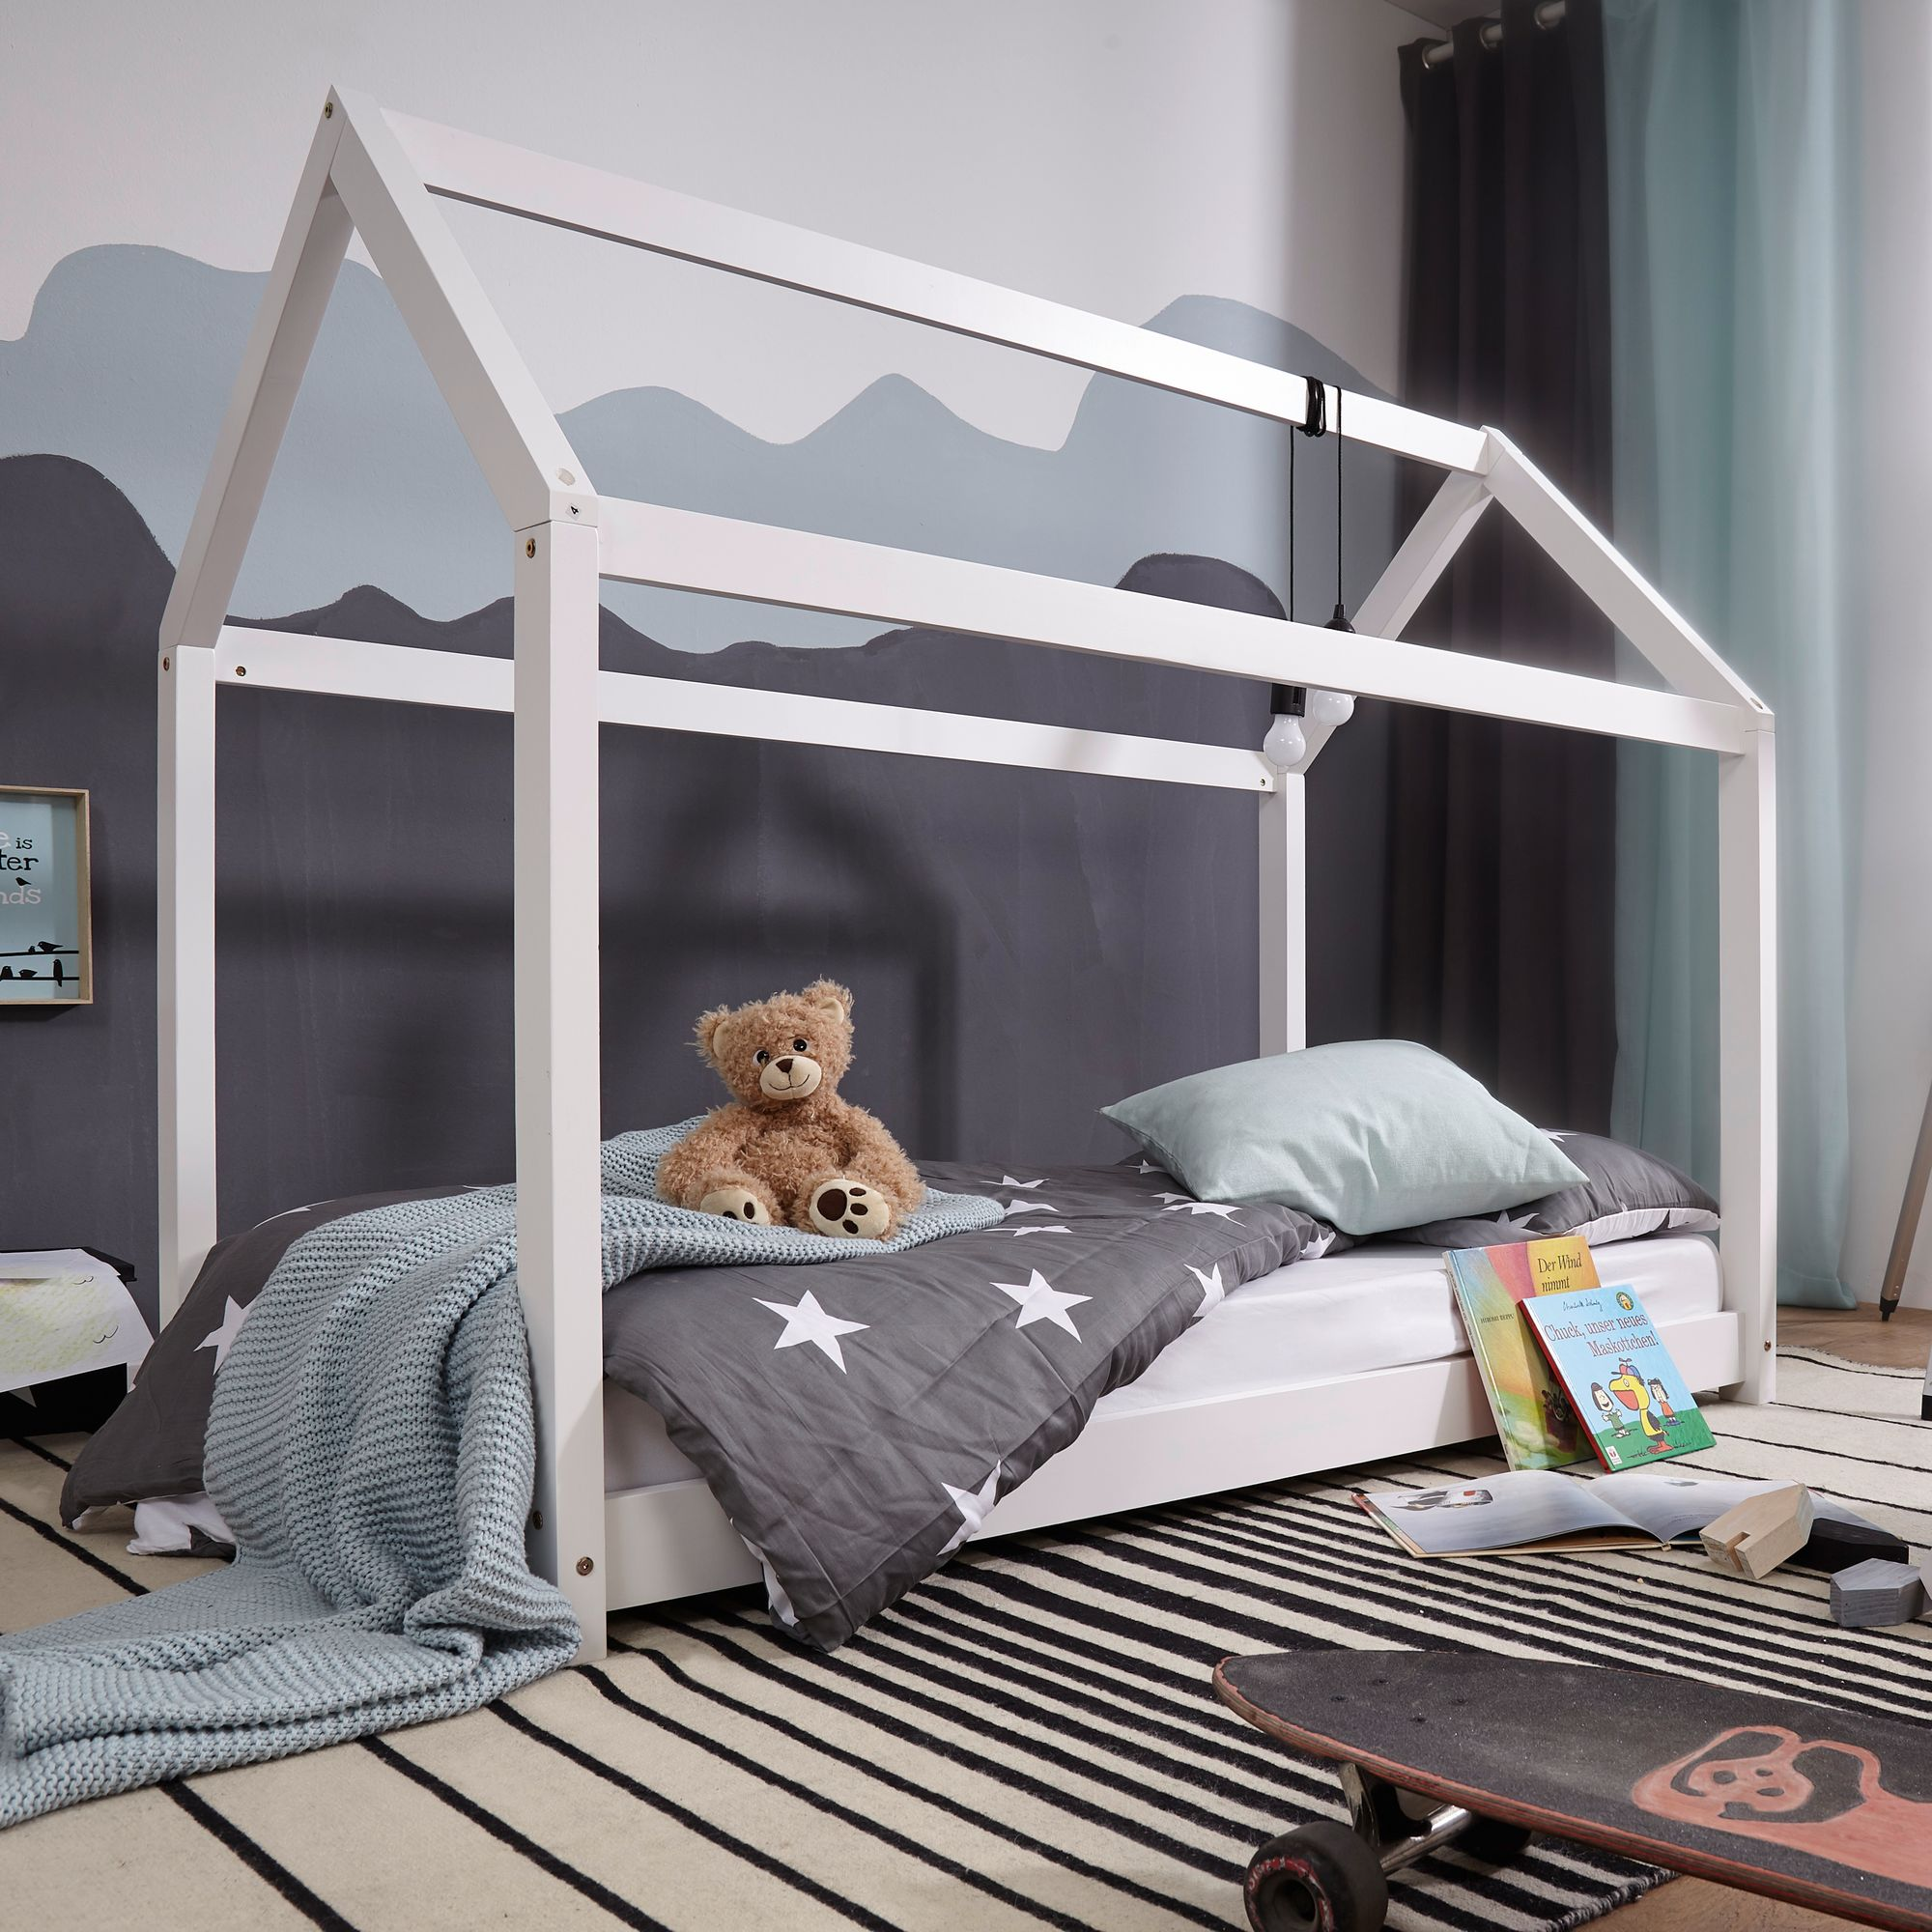 FineBuy Kinderbett Haus Weiß Holz Bett Kinder Schlafbett Hausbett Lattenrost